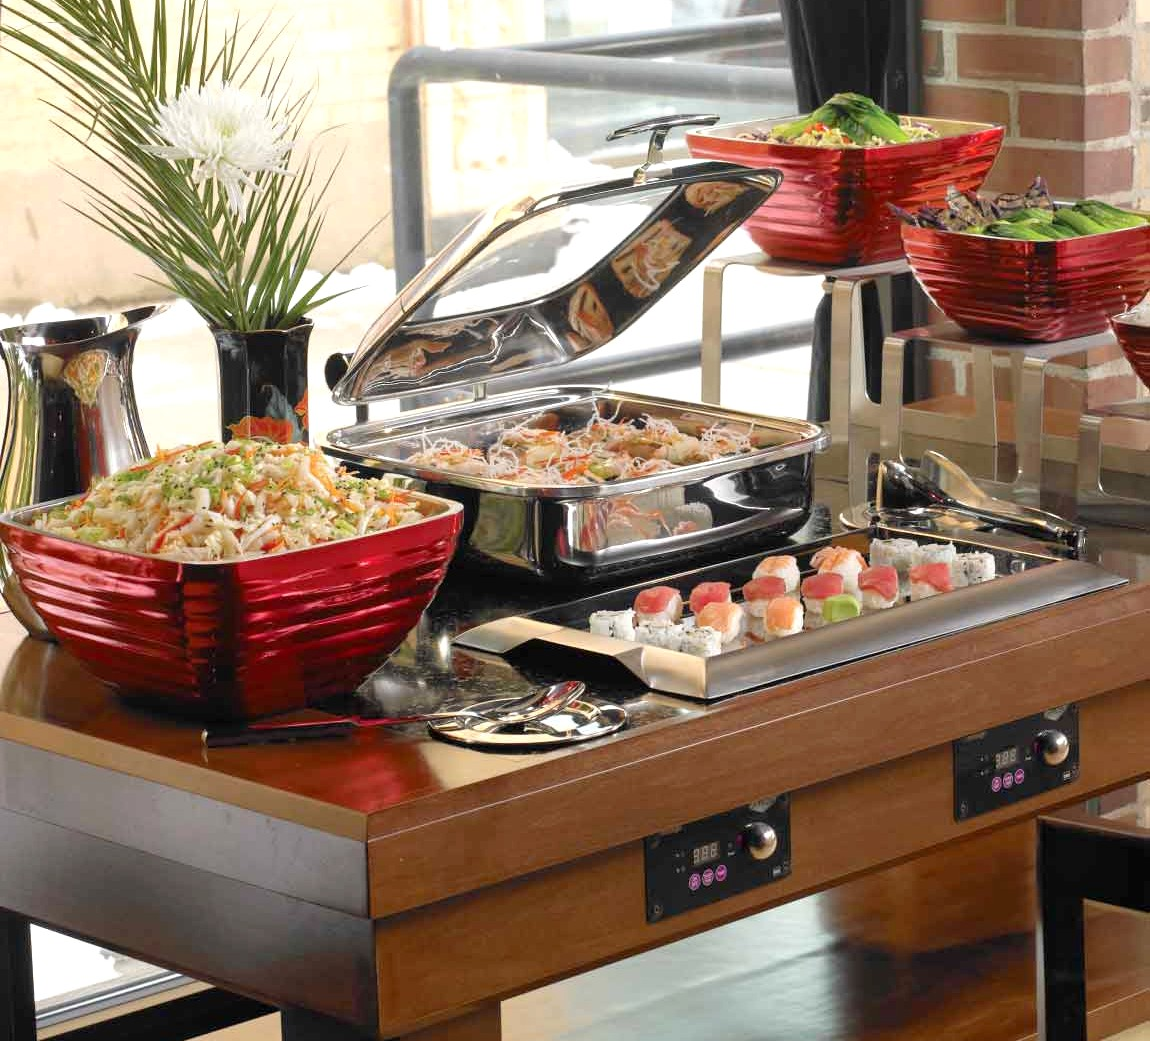 L induction hrimag hotels restaurants et institutions for Plaque cuisson restaurant